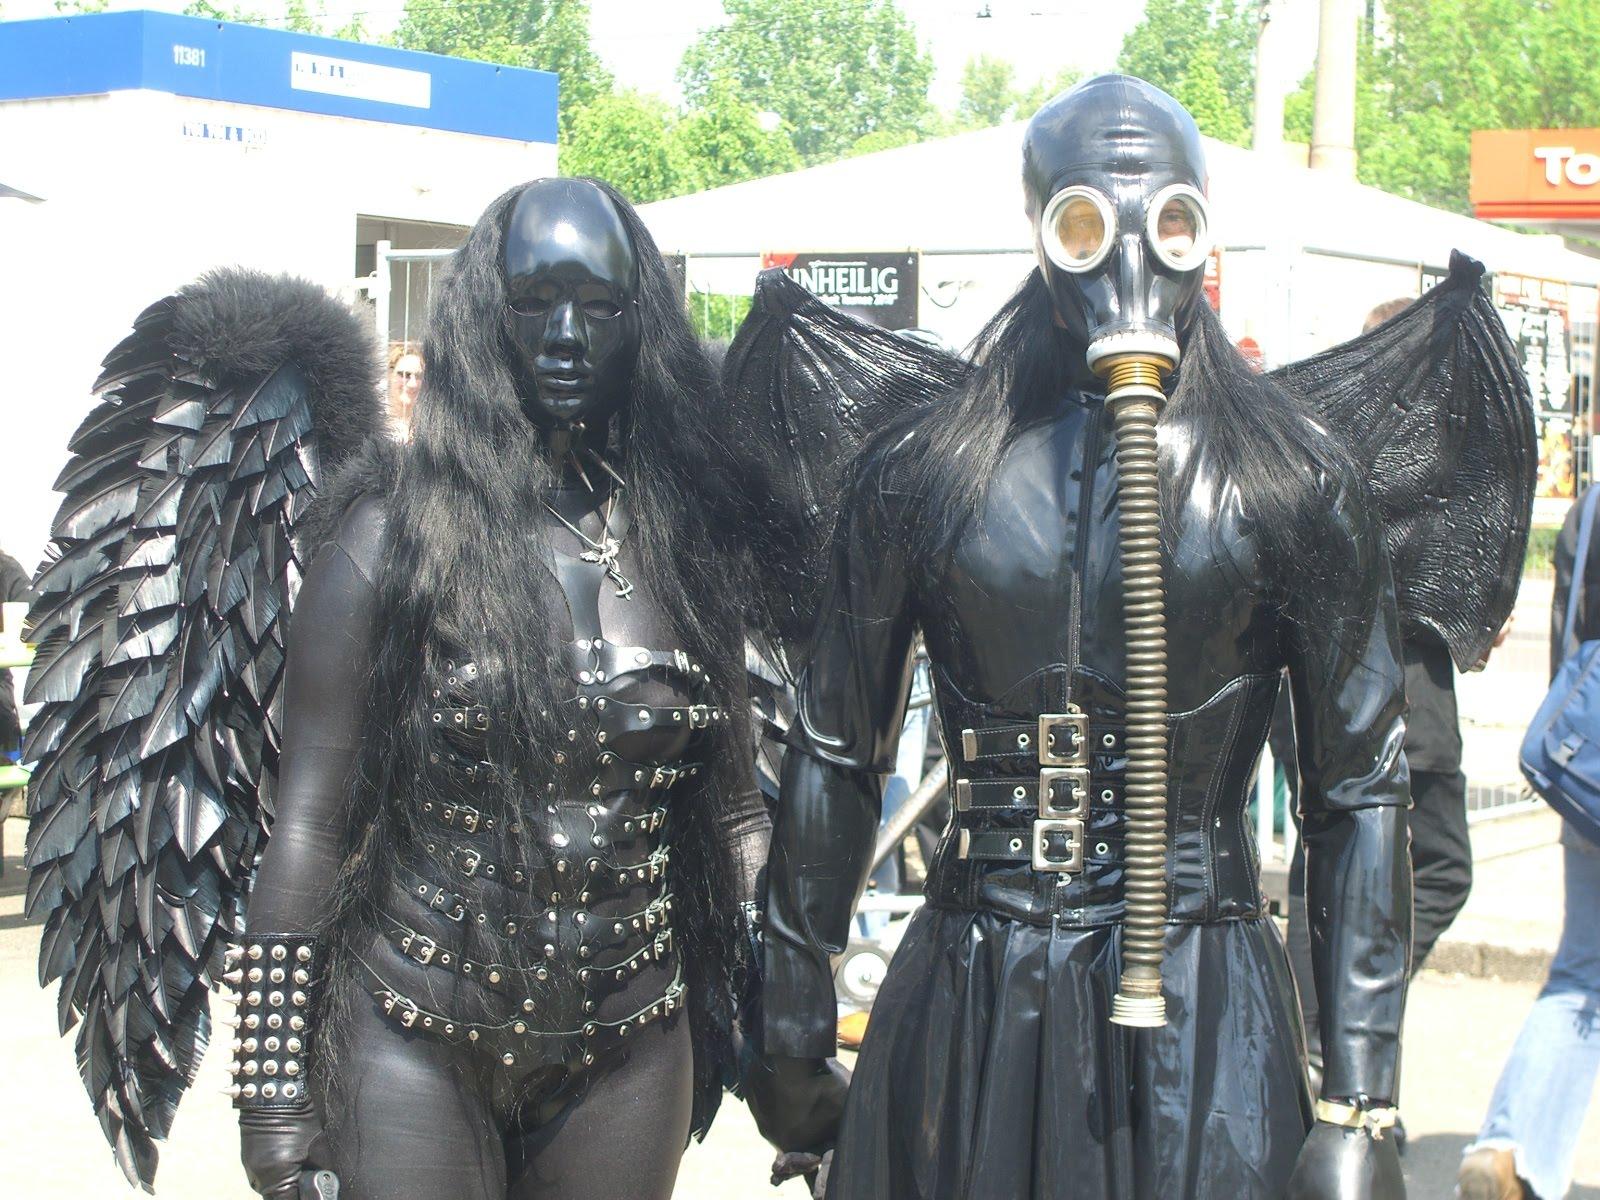 Wave-Gotik-Treffen - Photos - Horror Demons